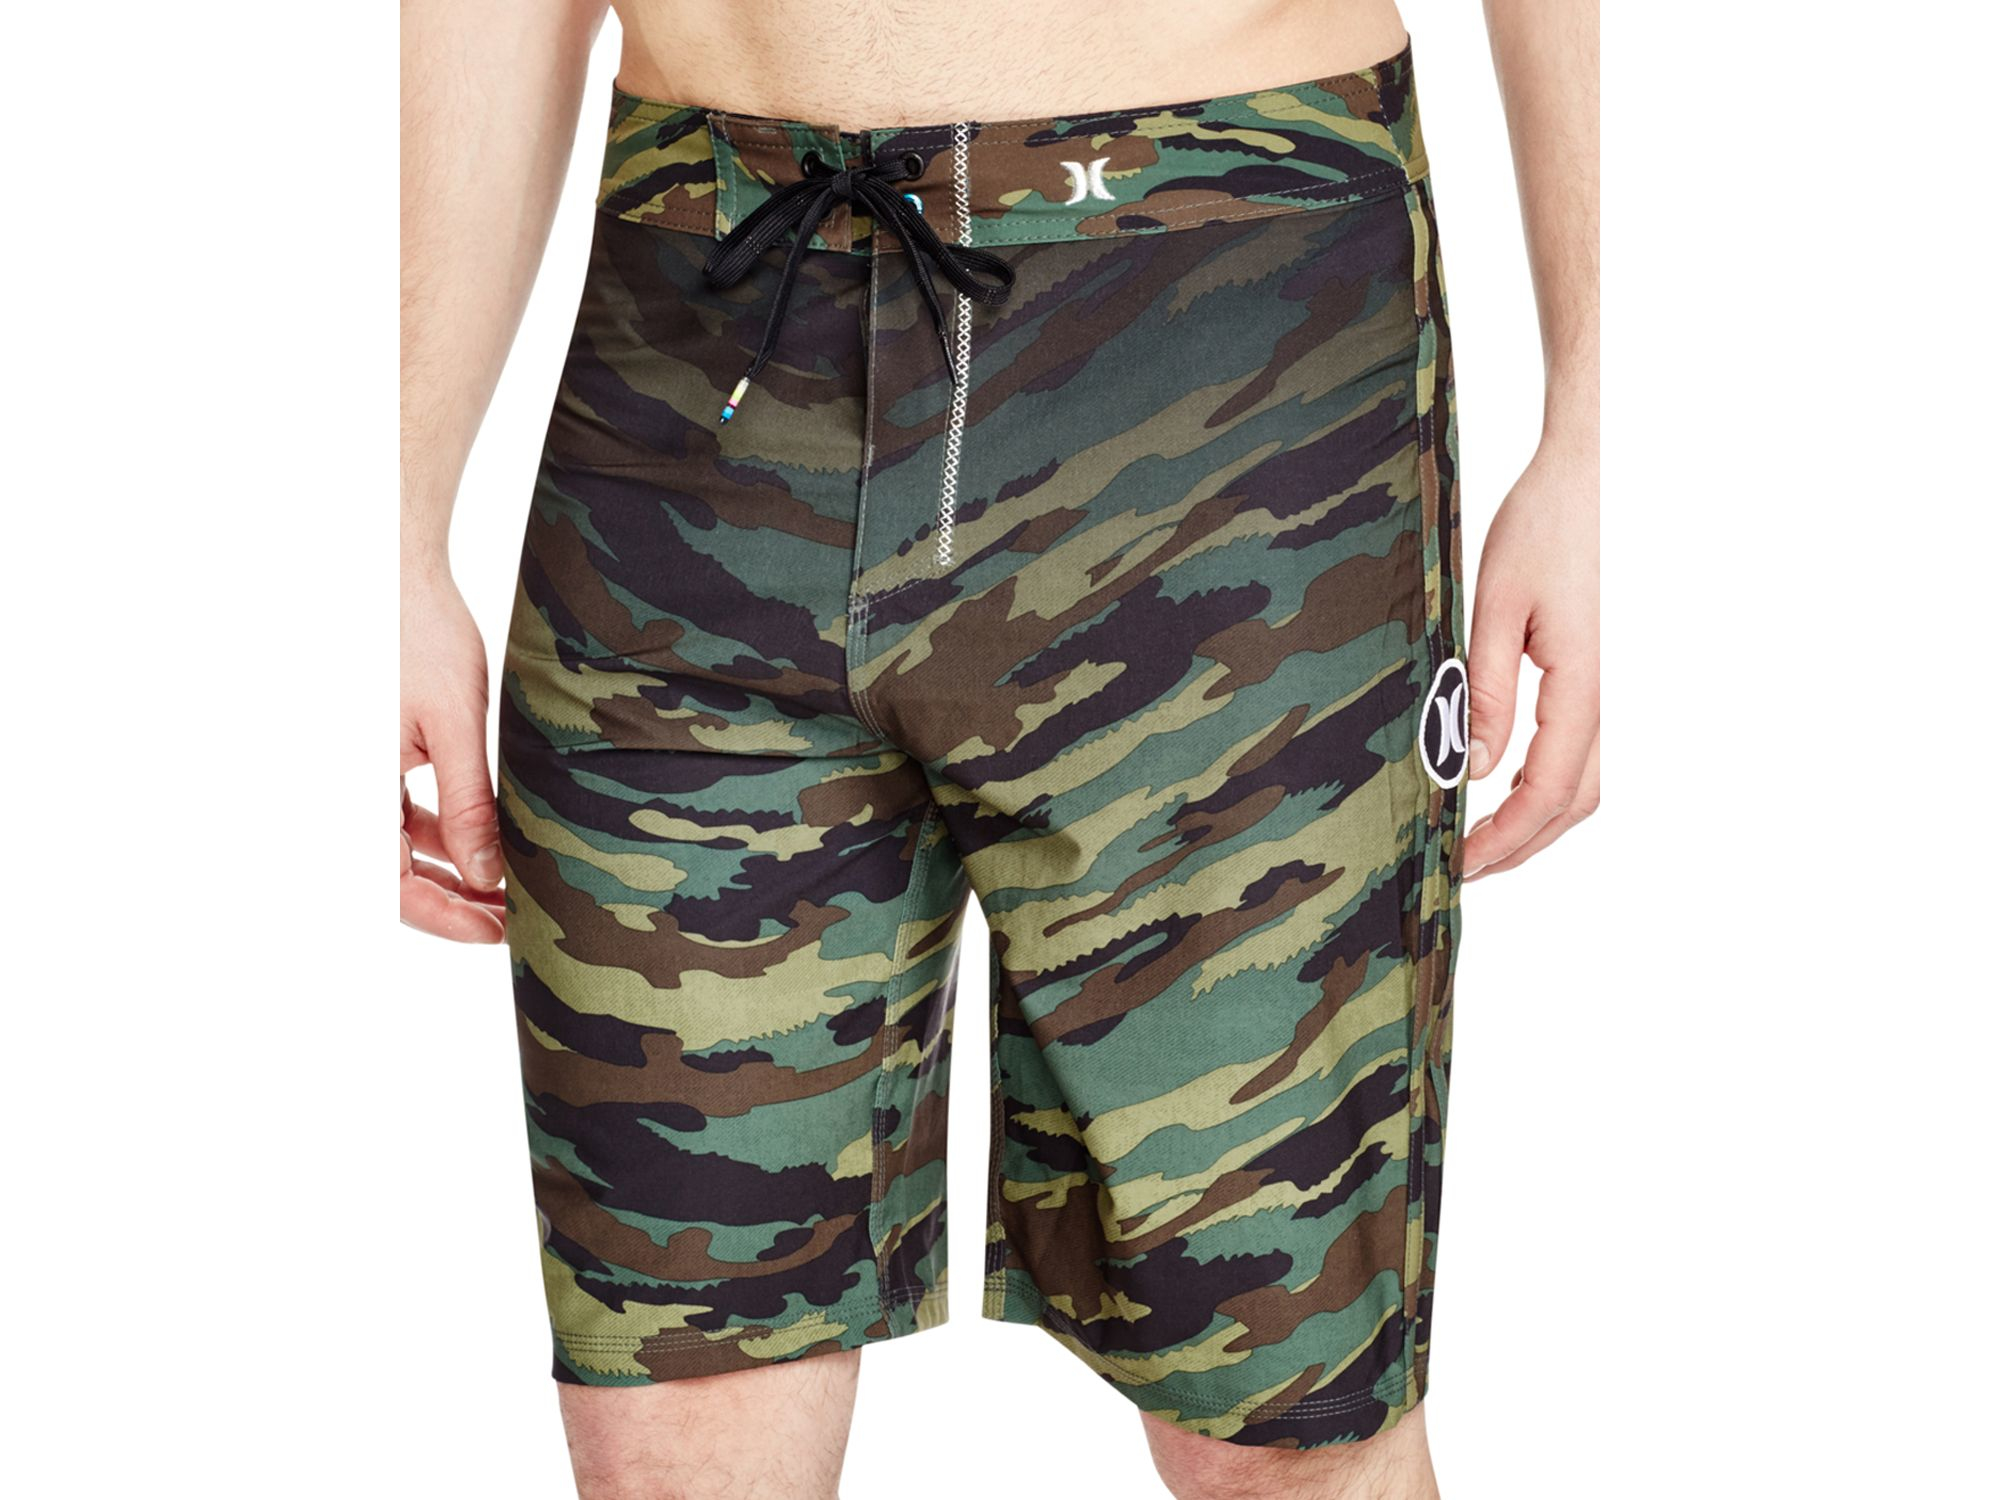 e762b79863 Hurley Green Phantom Camouflage Board Shorts for men